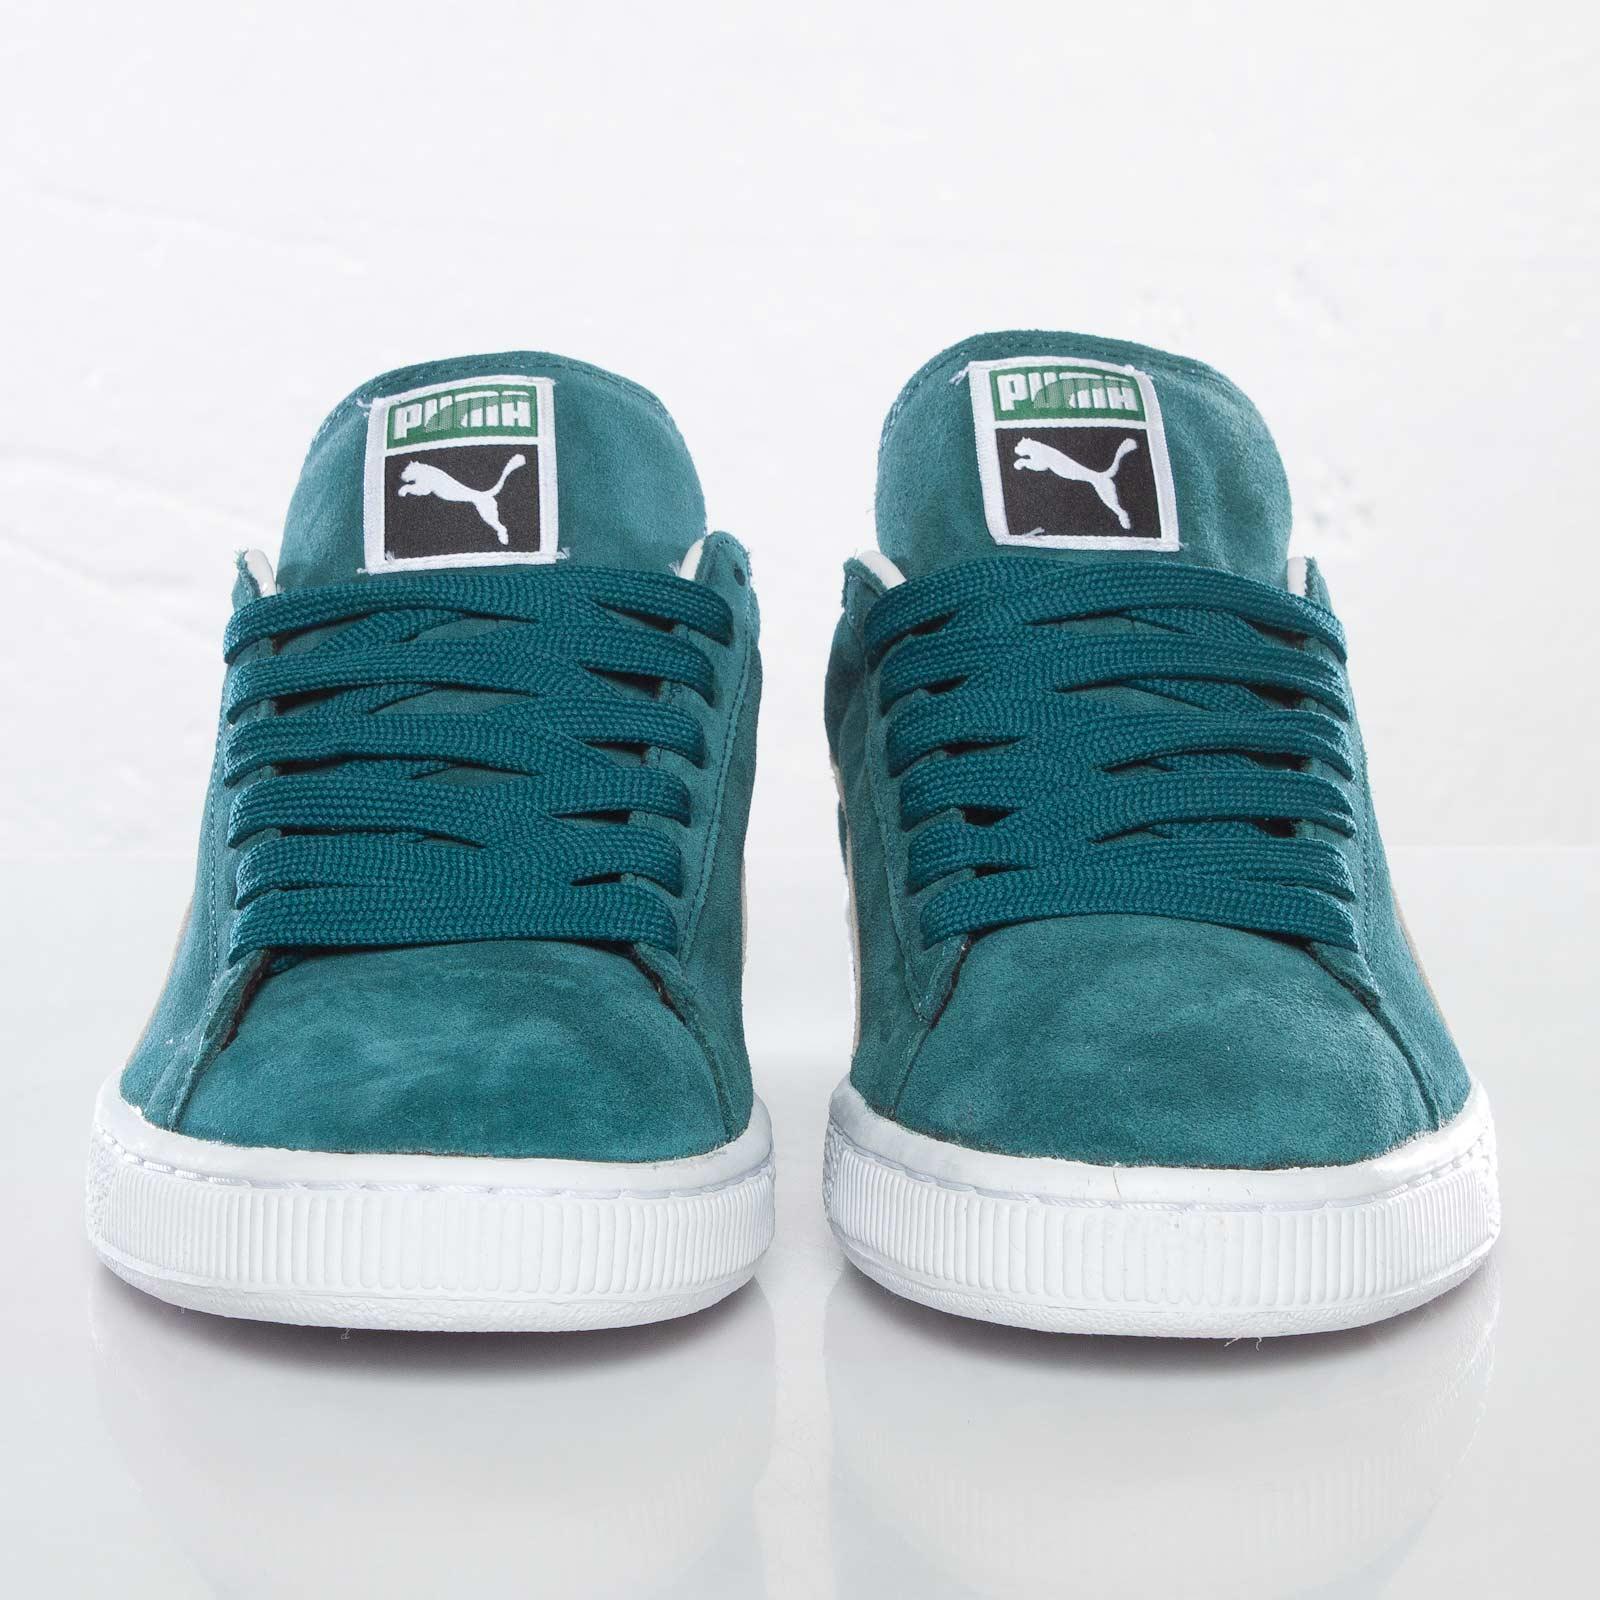 Puma Suede Classic+ - 352634-83 - Sneakersnstuff  06ba26925